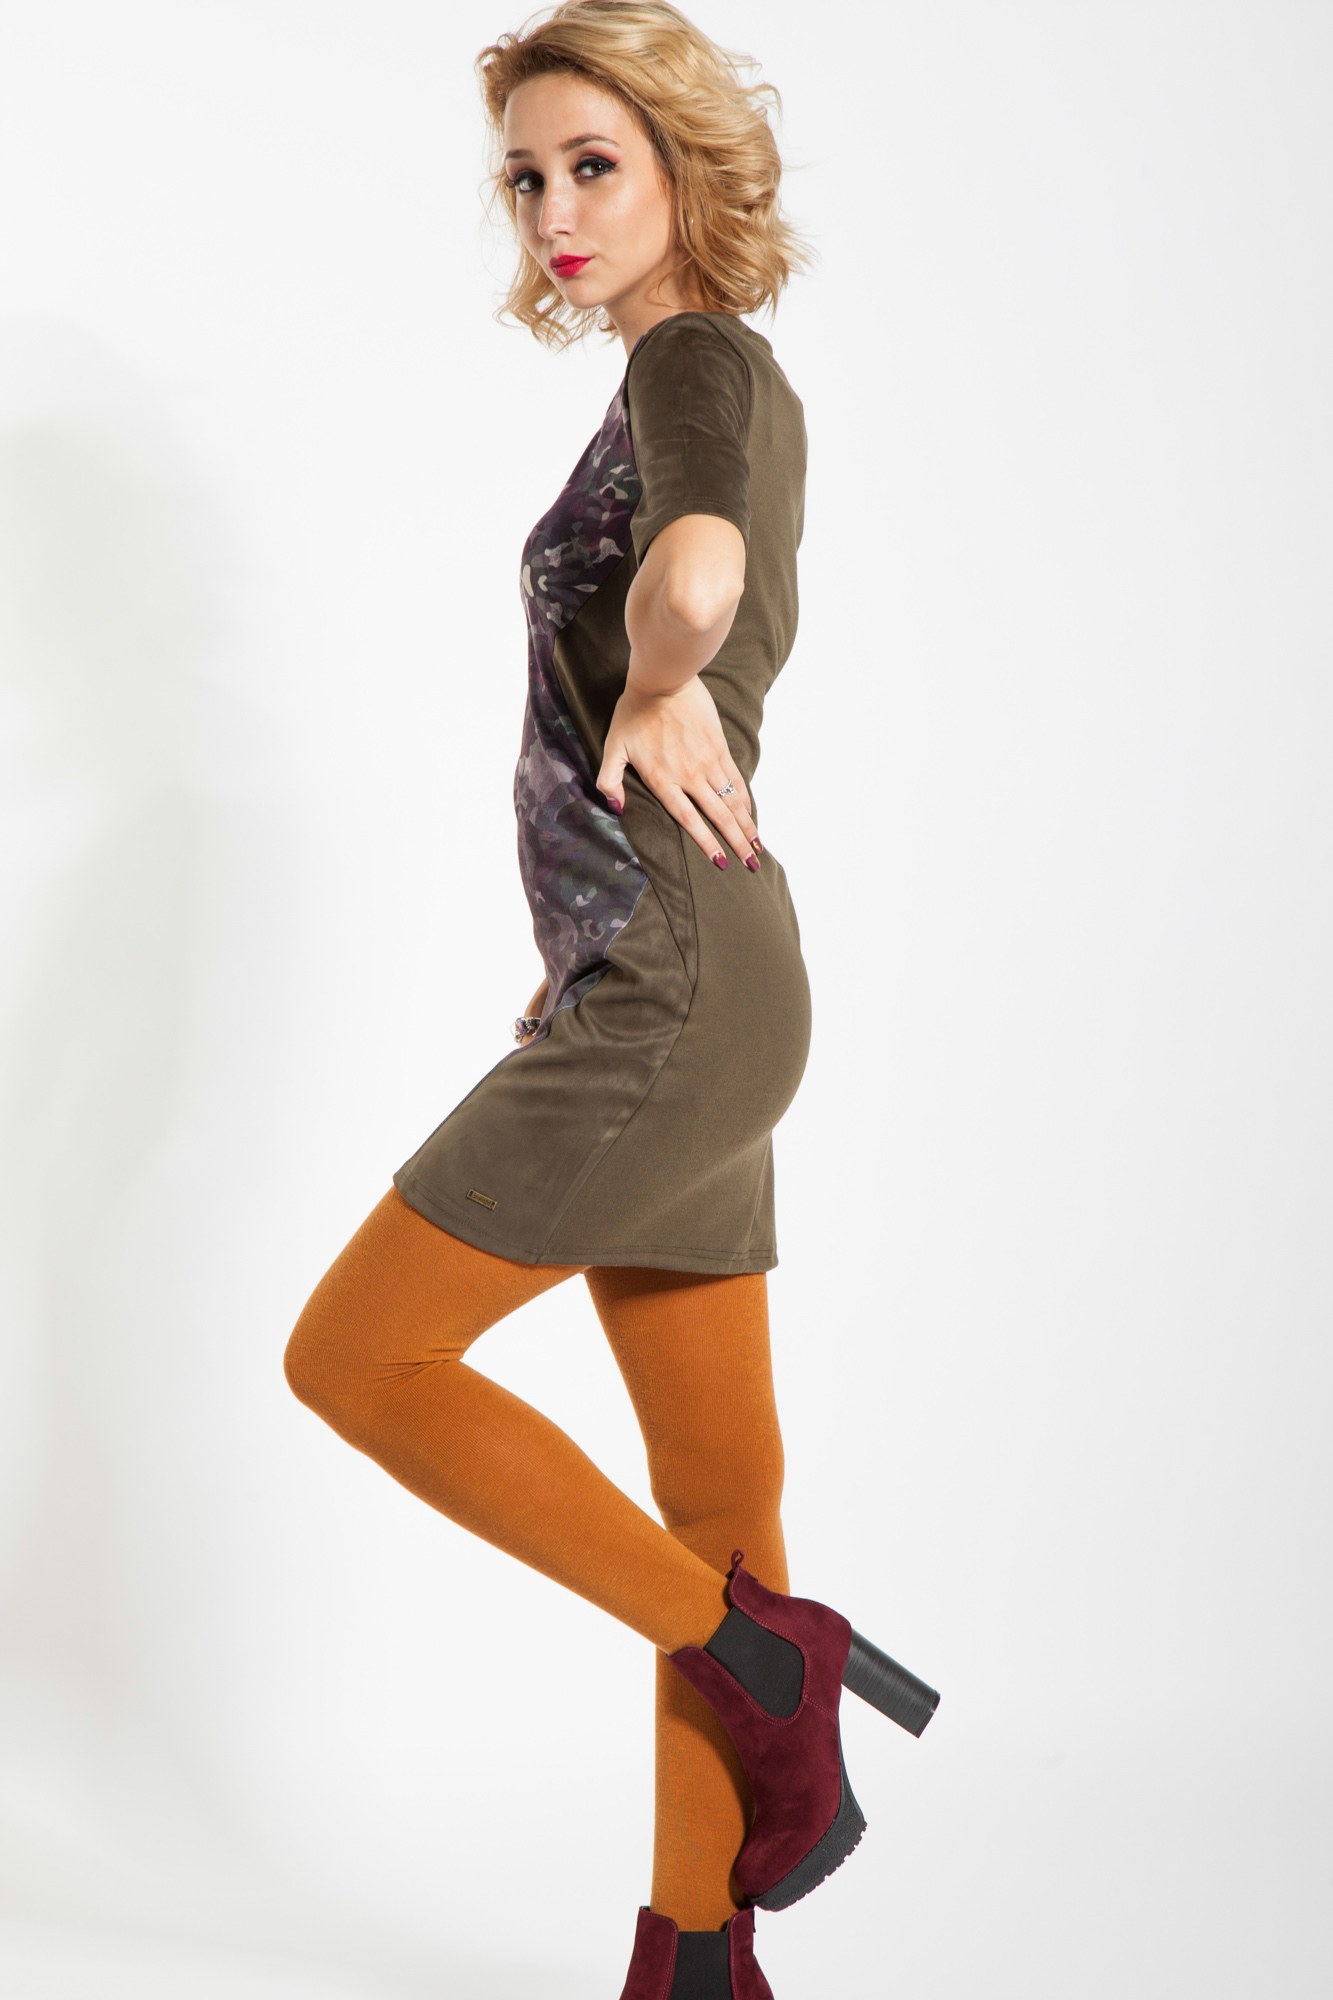 Rochie kaki Mercat insertii piele intoarsa